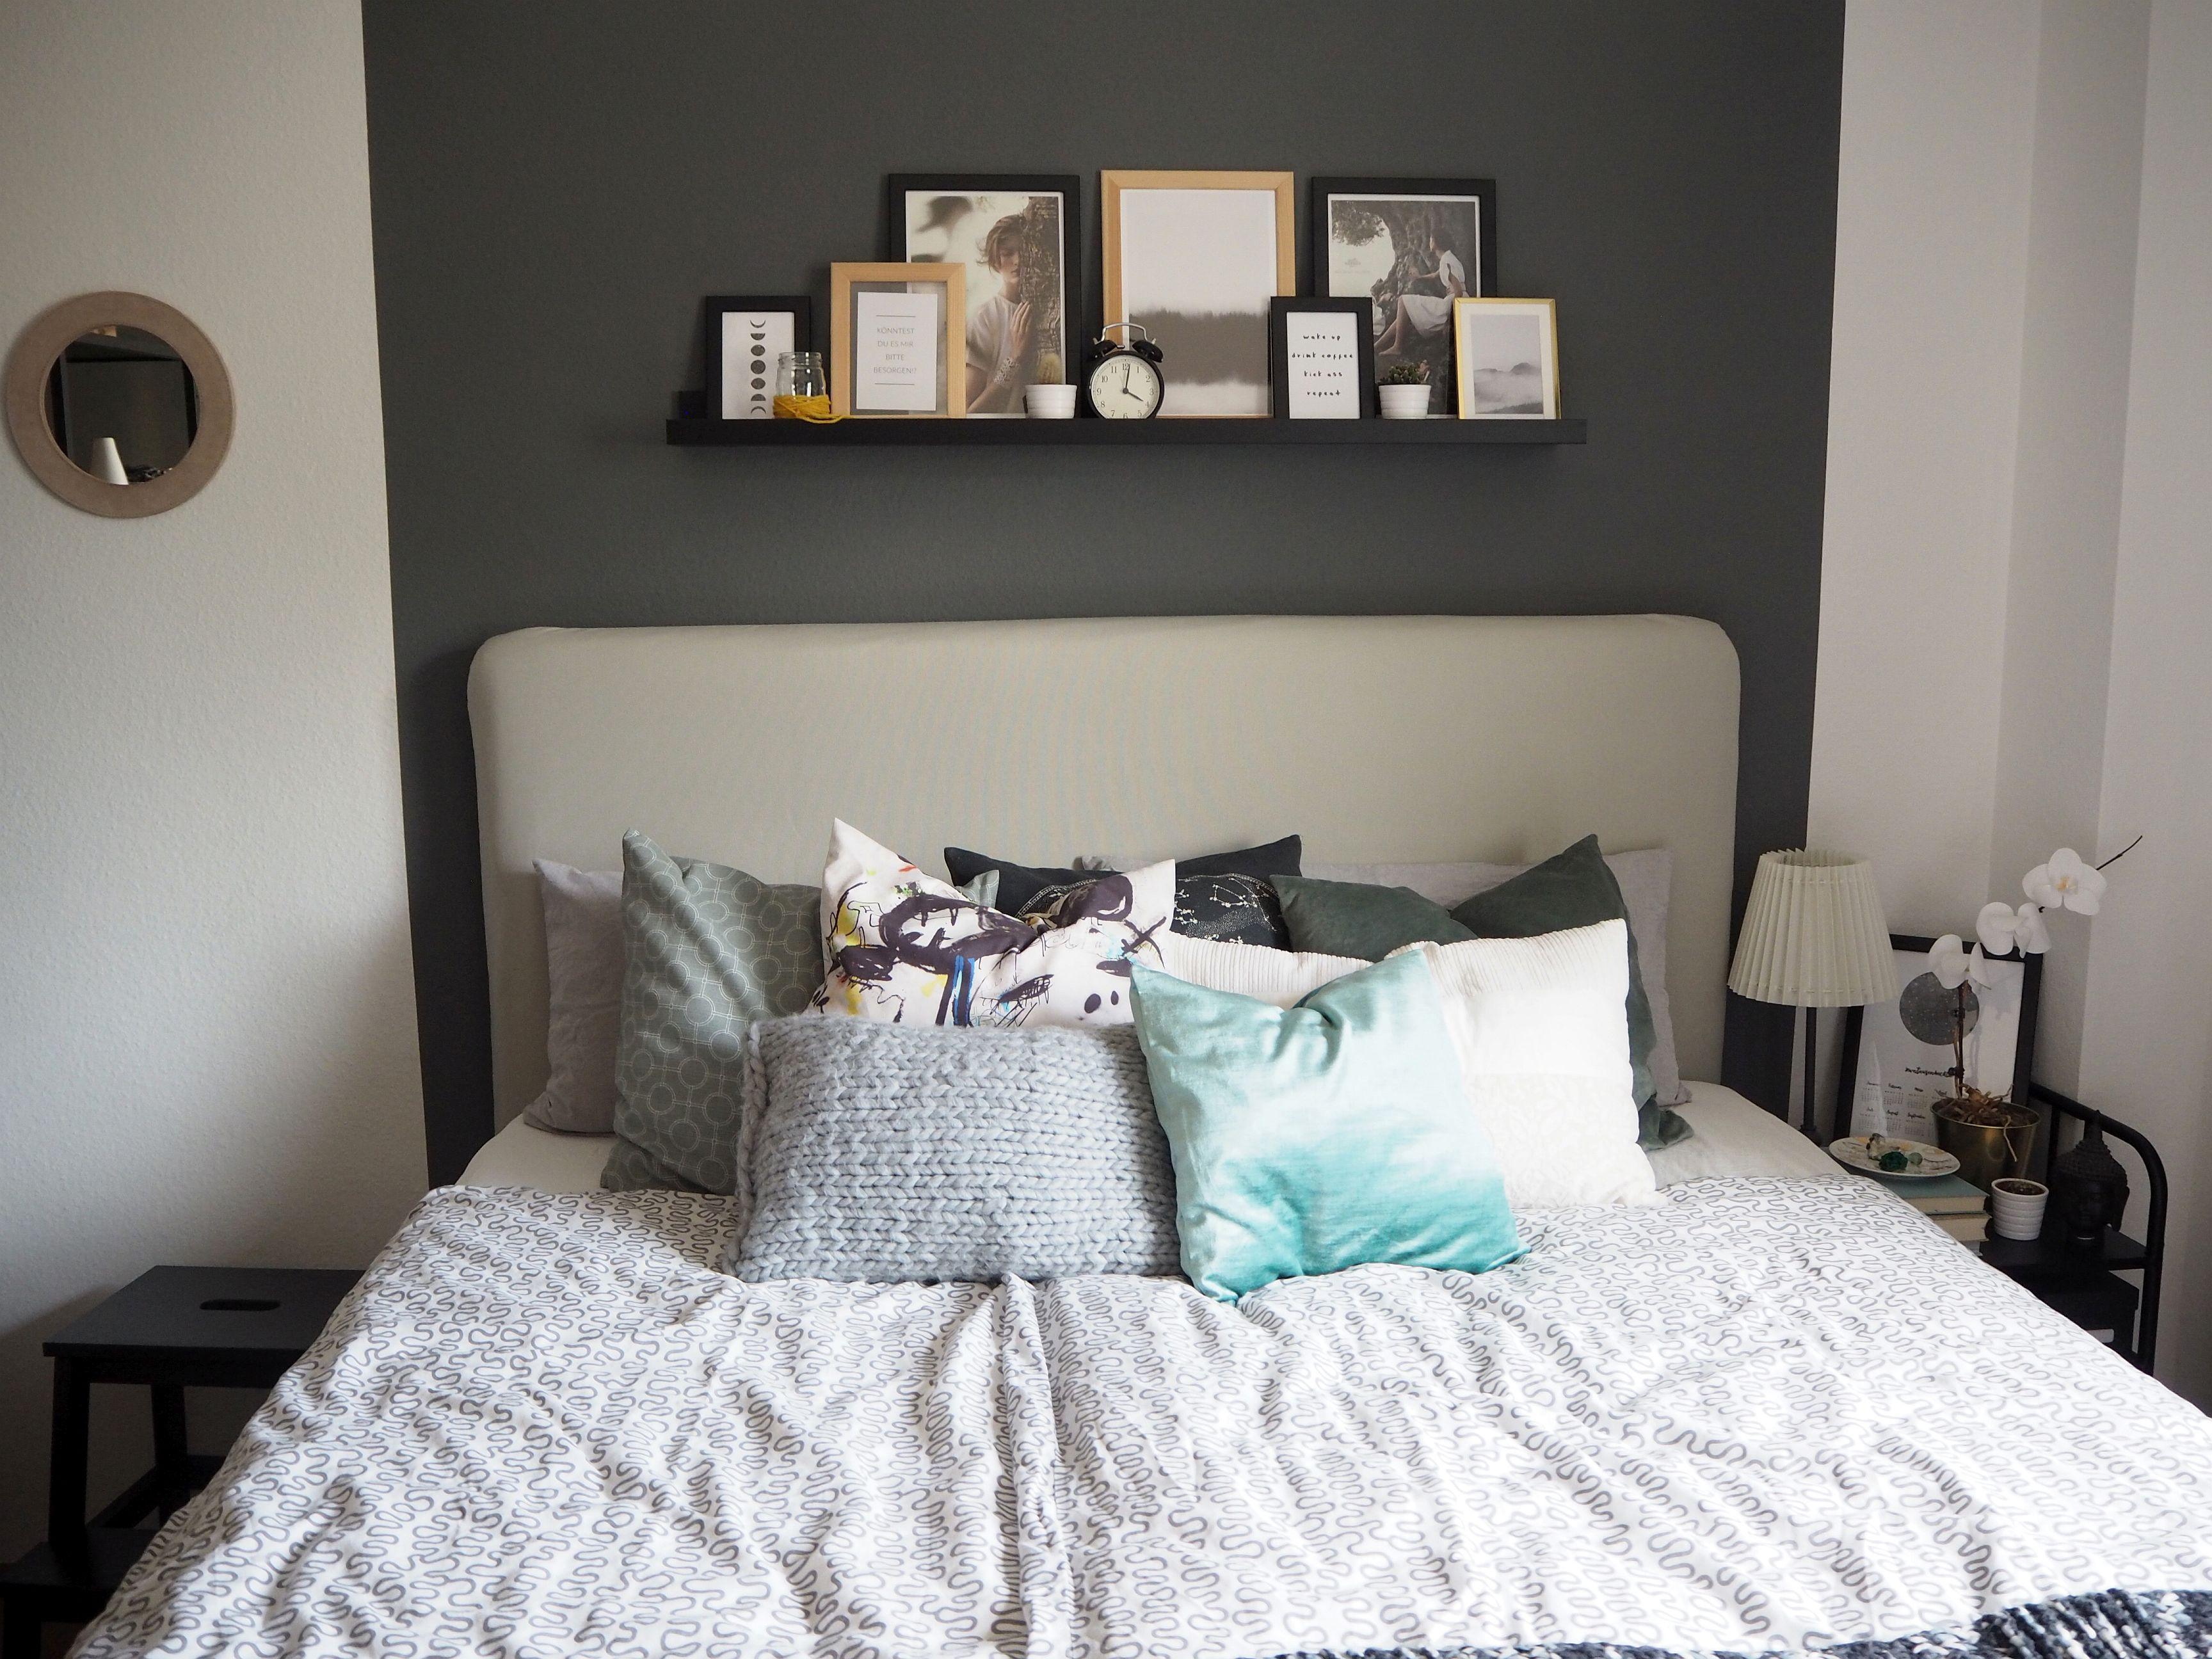 2018-06-skoen-och-kreativ-interior-schlafzimmer-wandgestaltung-pixers-gruen (24)